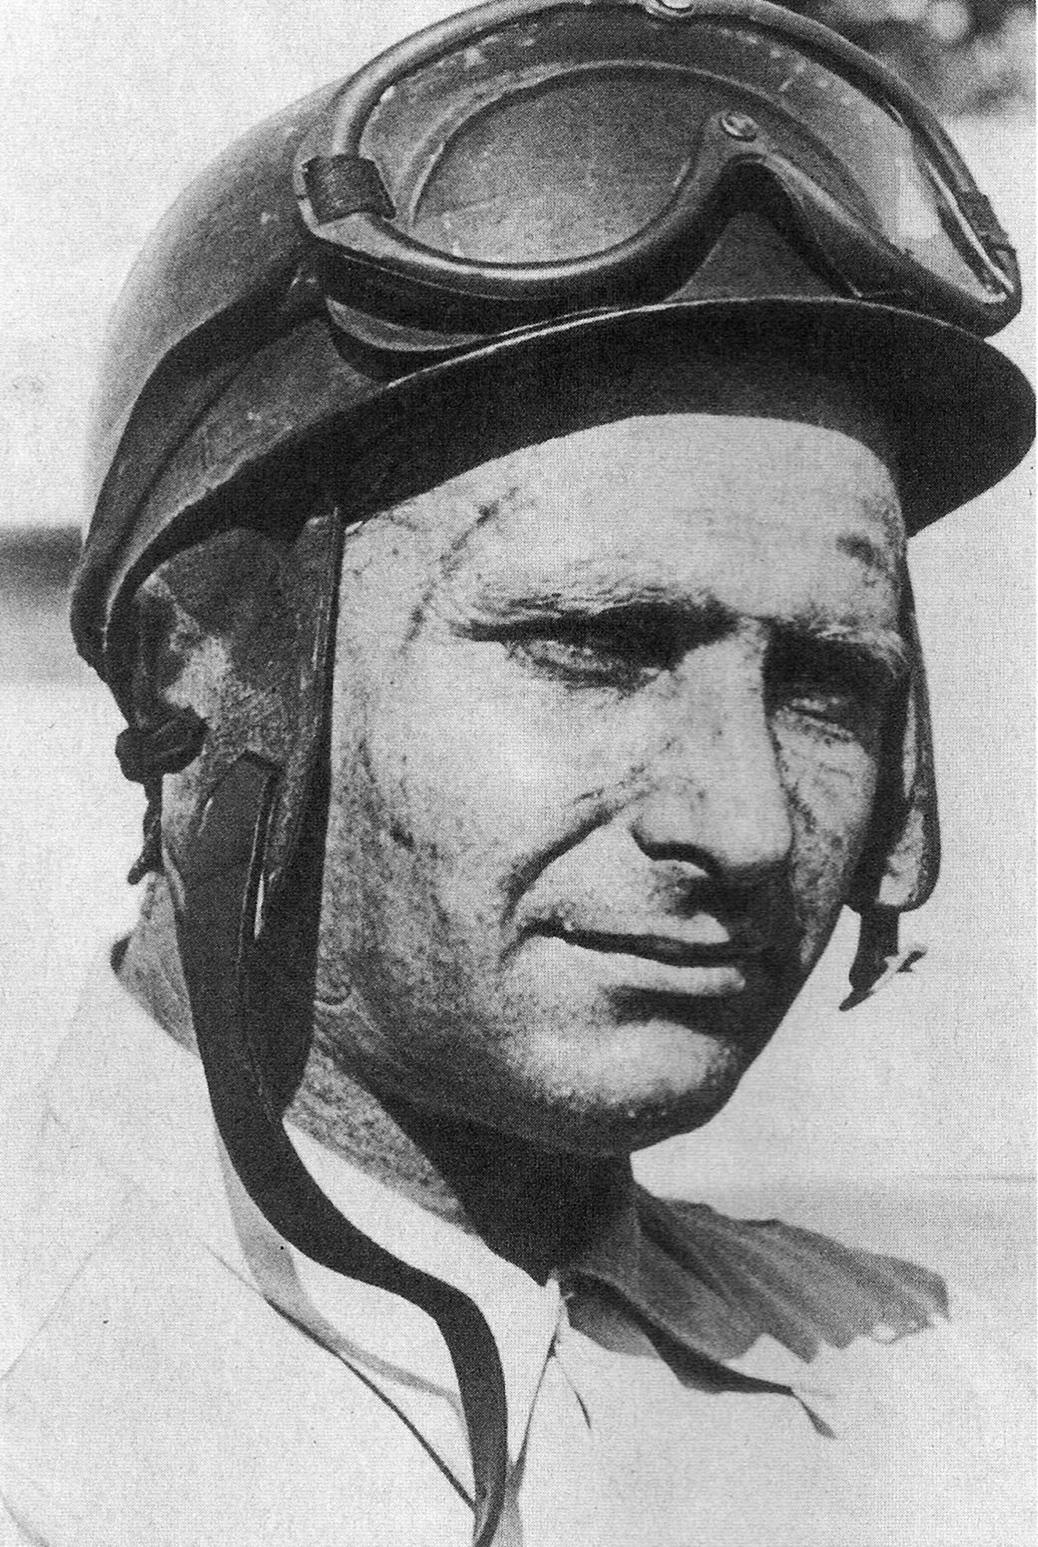 Depiction of Juan Manuel Fangio